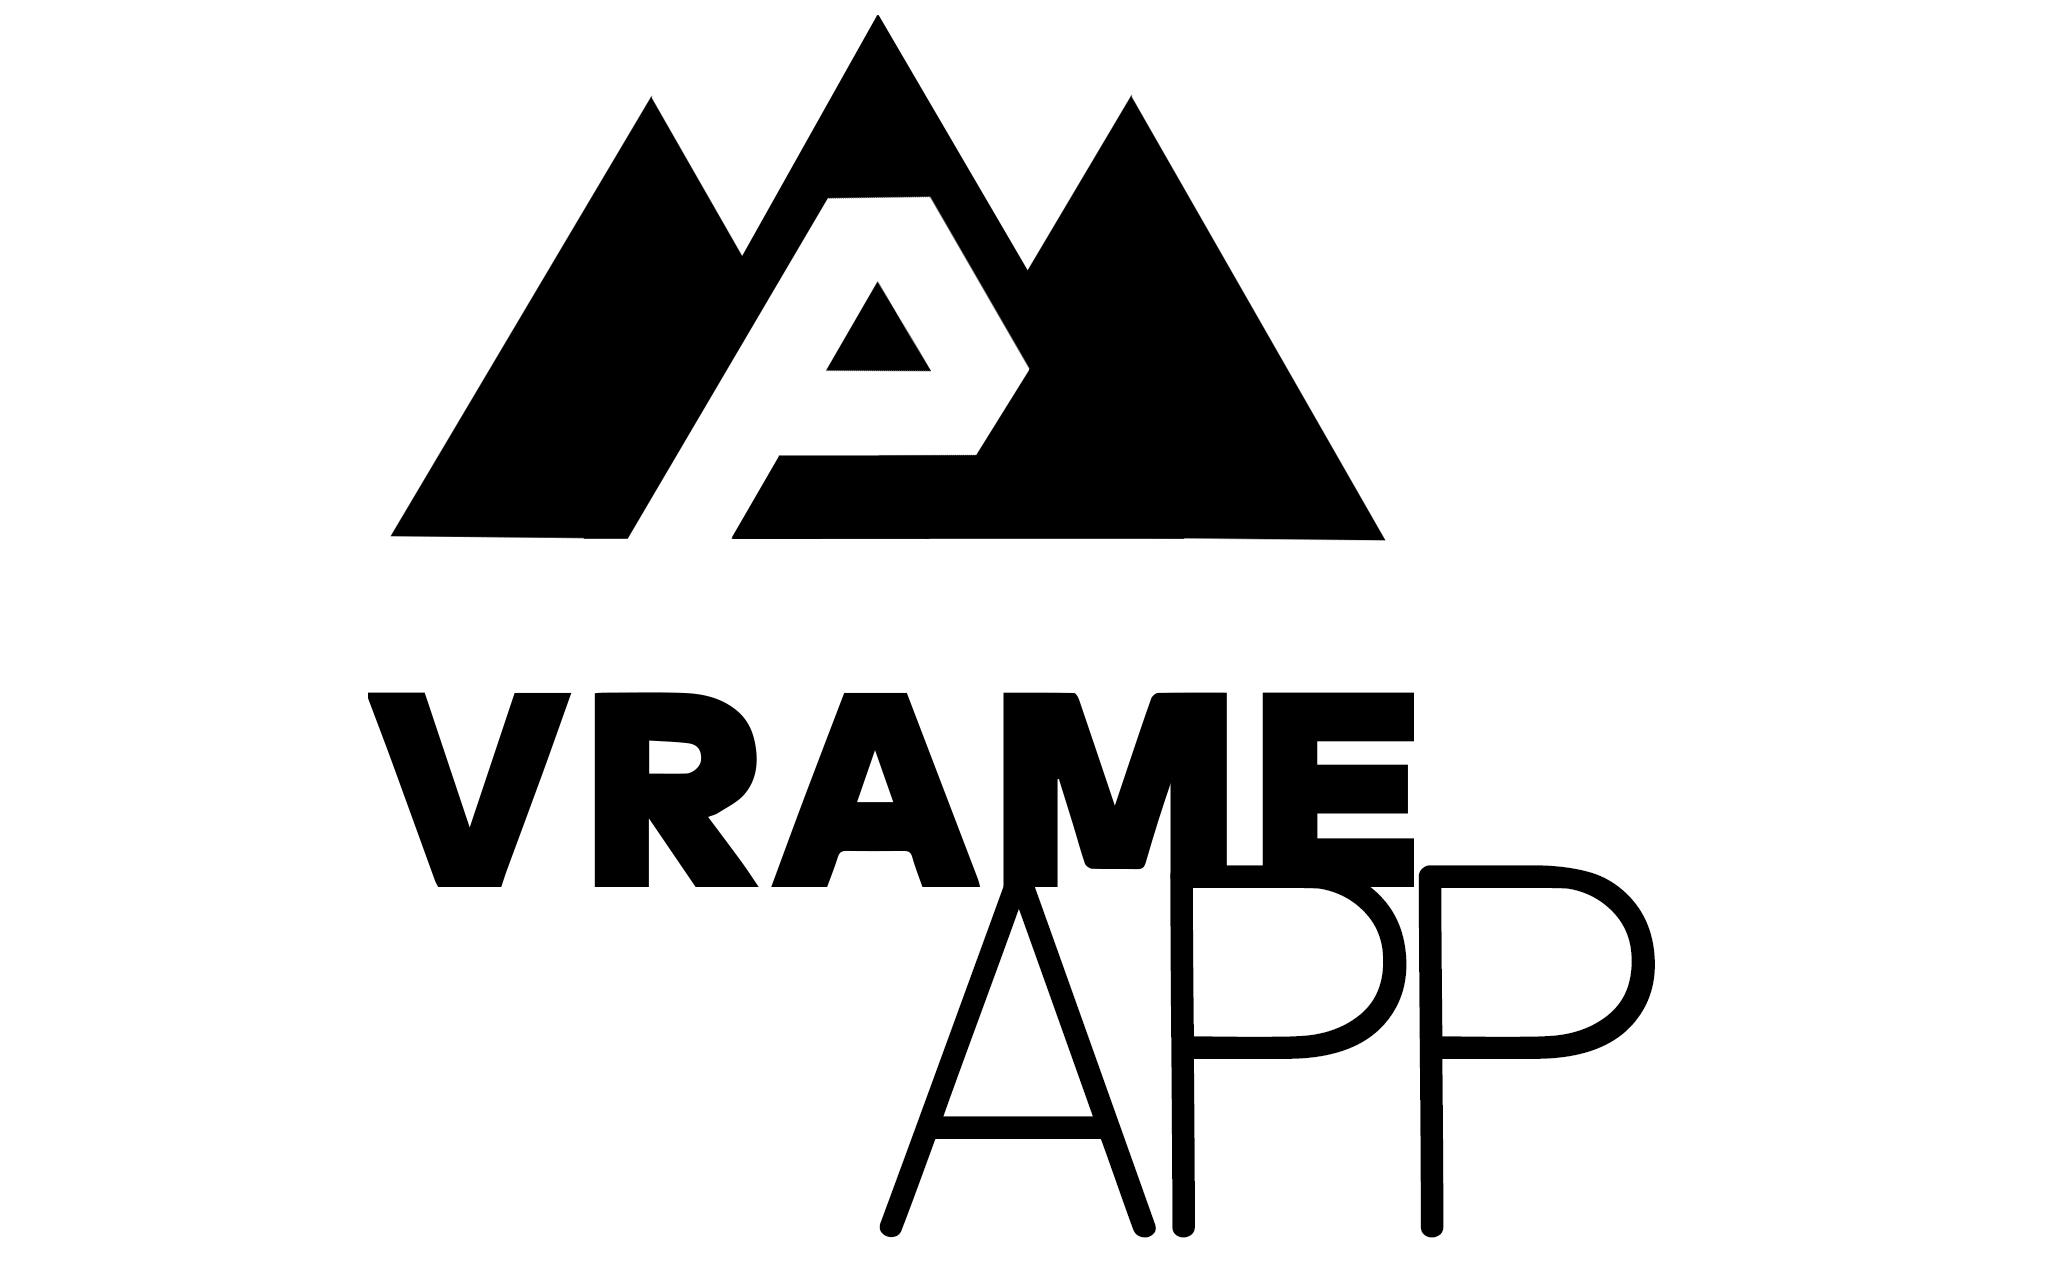 vrame-app-logo-kleiner